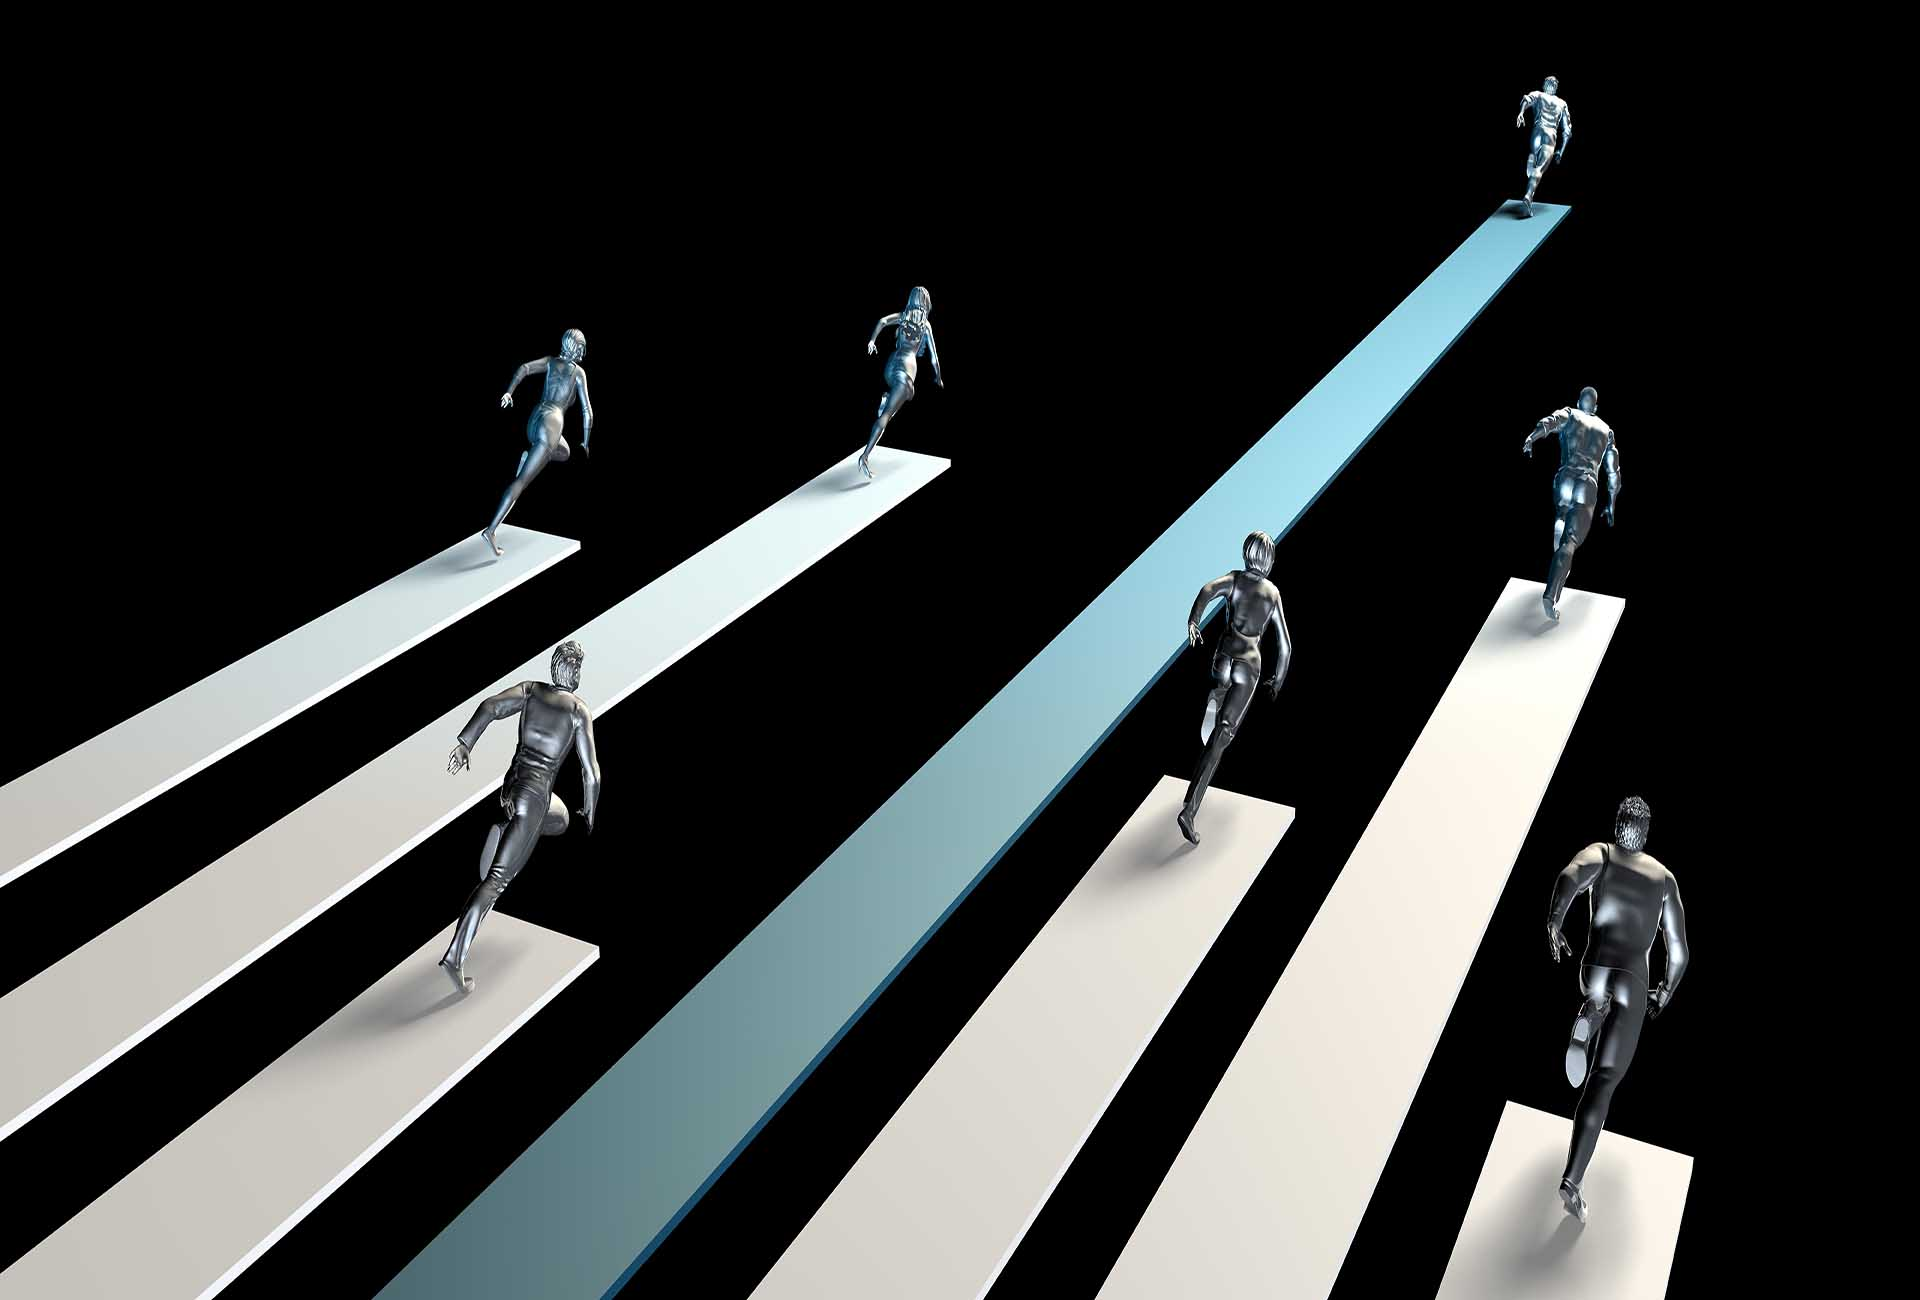 Five Reasons To Modernize Your Approach To Enterprise Content Management - Partners